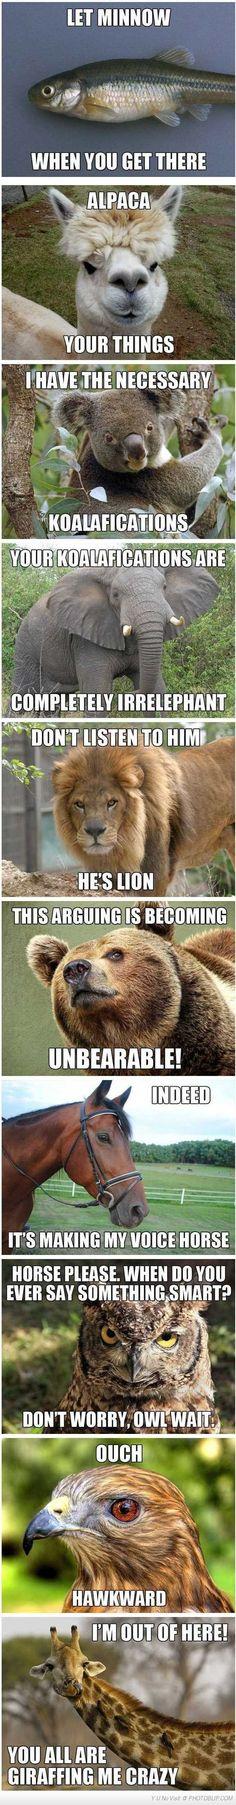 Animal Meme Compilation